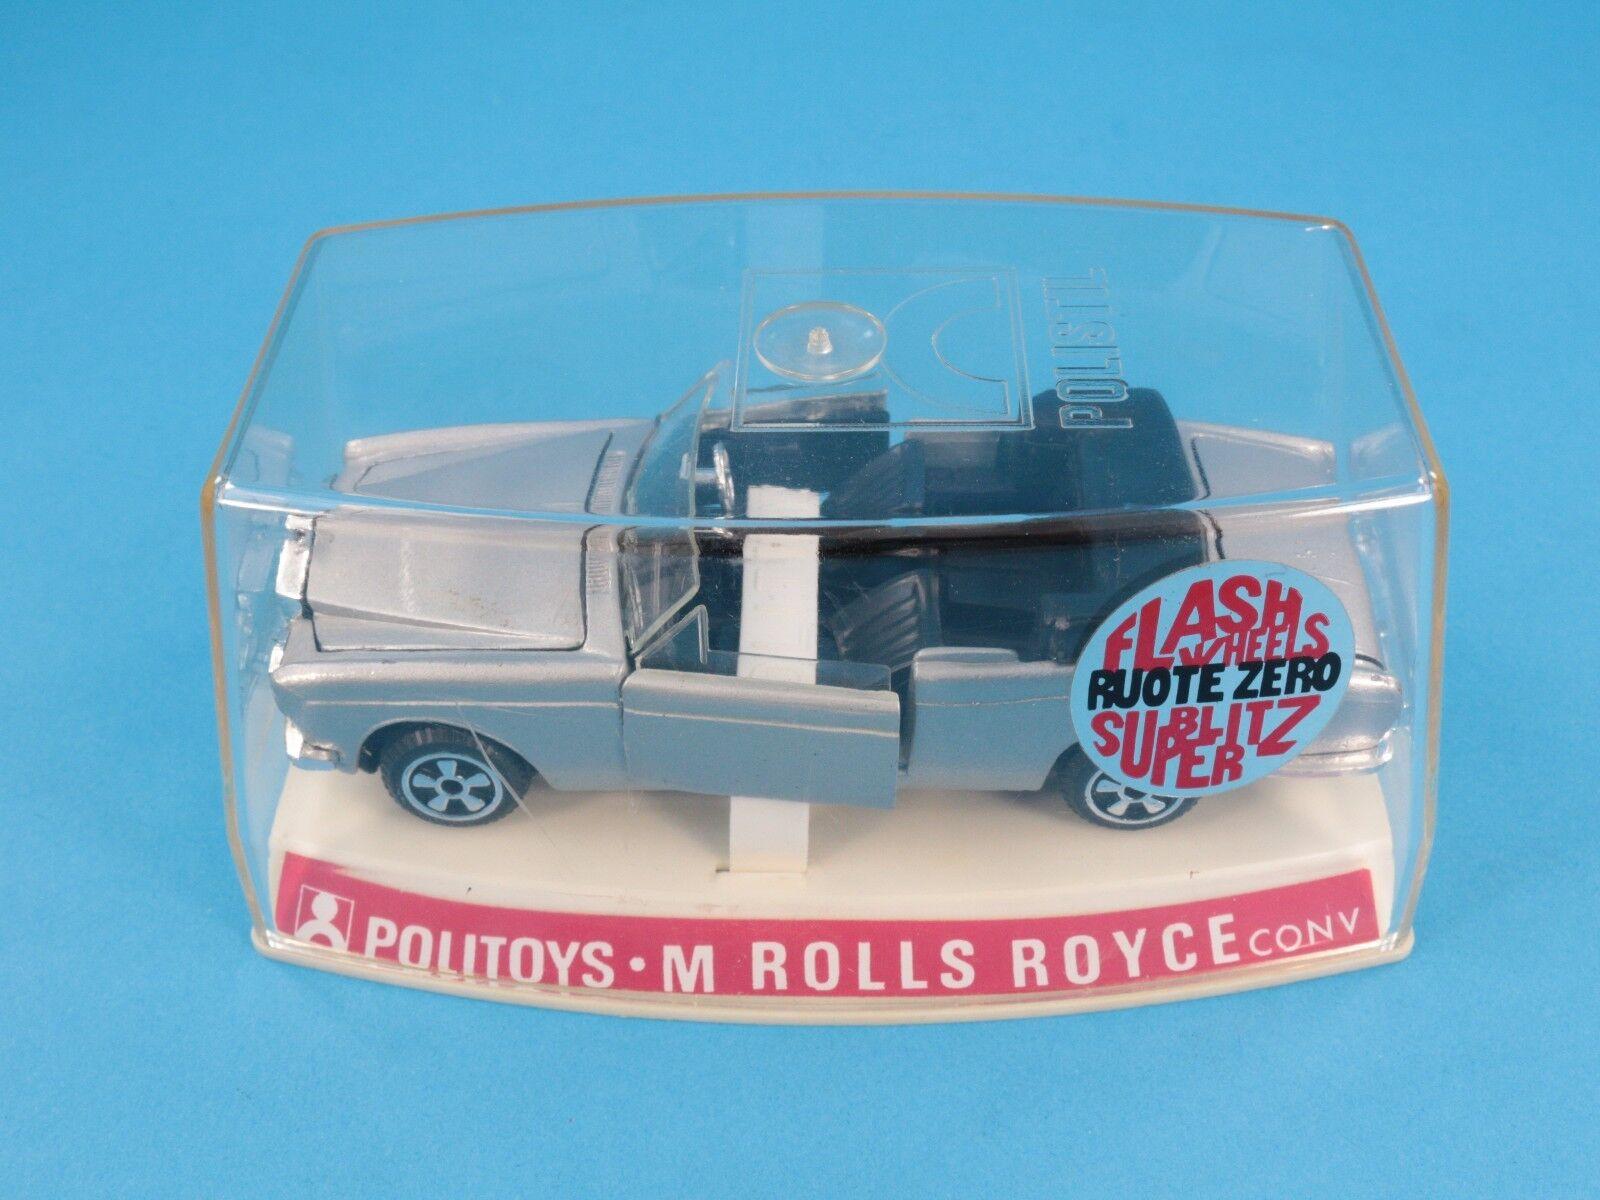 1 43 Politoys M Nº 593 Roll Royce Congreenible - 1 ° 1969 Series-Boxed [ot3-015]